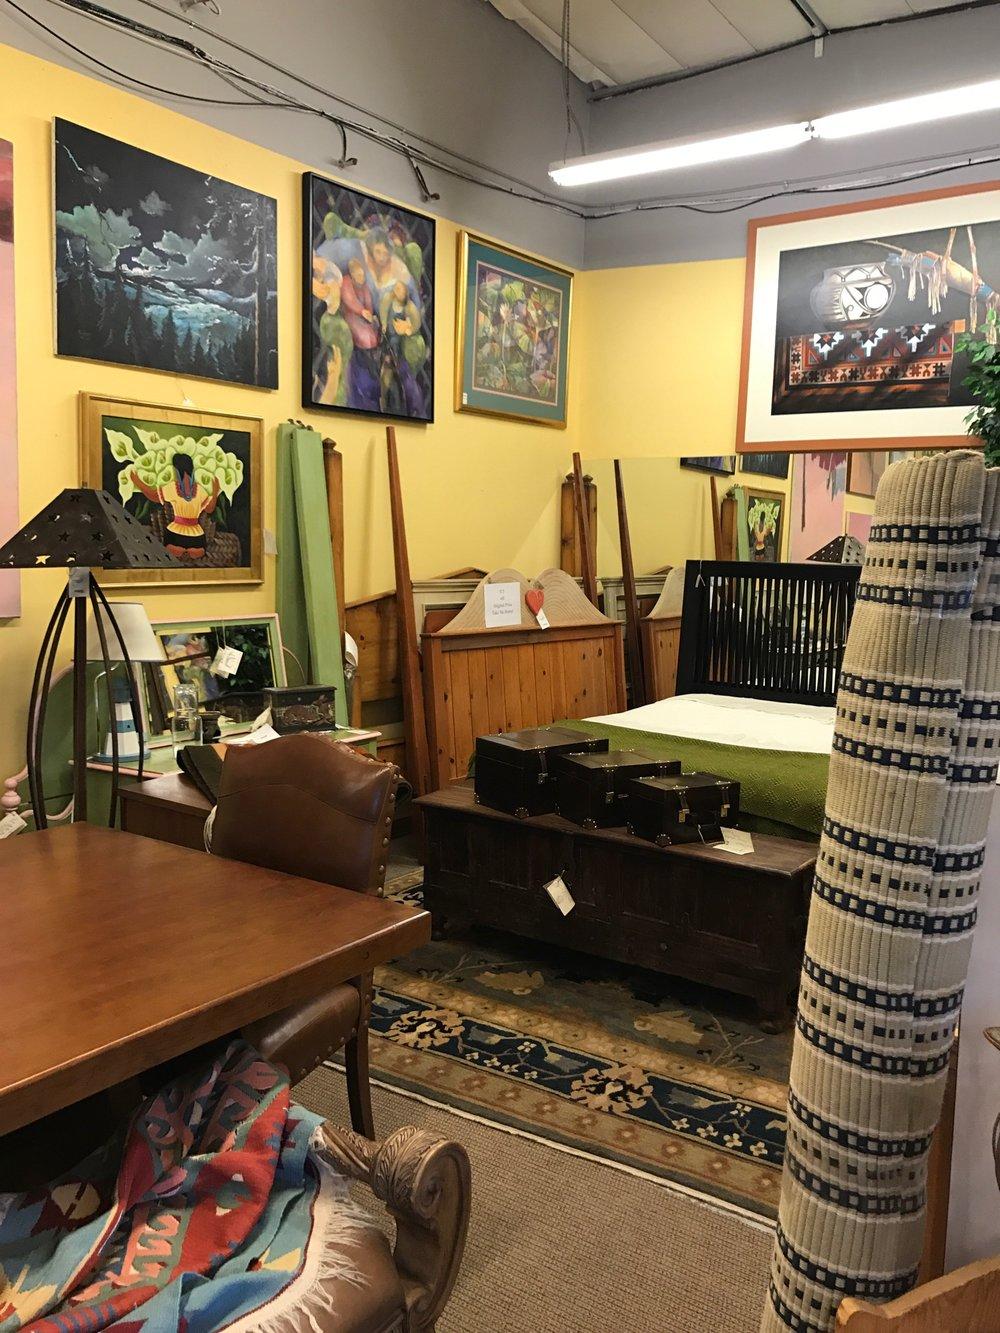 Furniture consignment stores in santa fe nm - Img_1902 Jpg